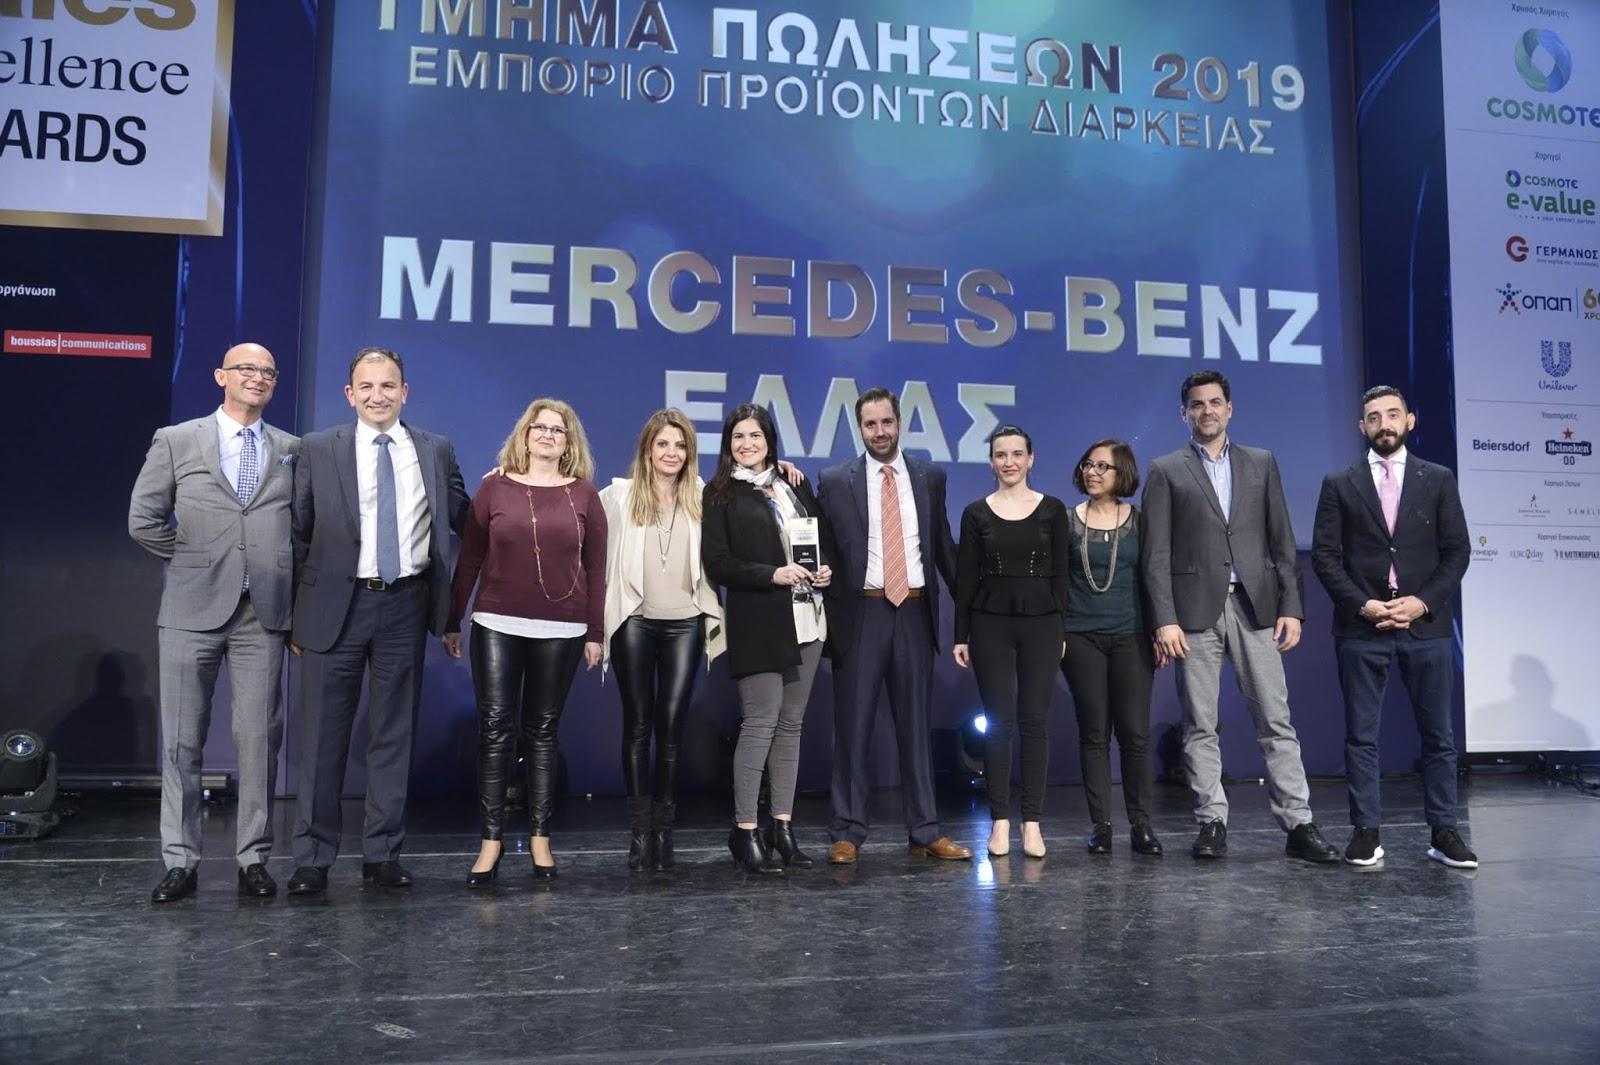 25CE259Cercedes Benz2BSales2BTeam Διπλή βράβευση για τη Mercedes-Benz Ελλάς